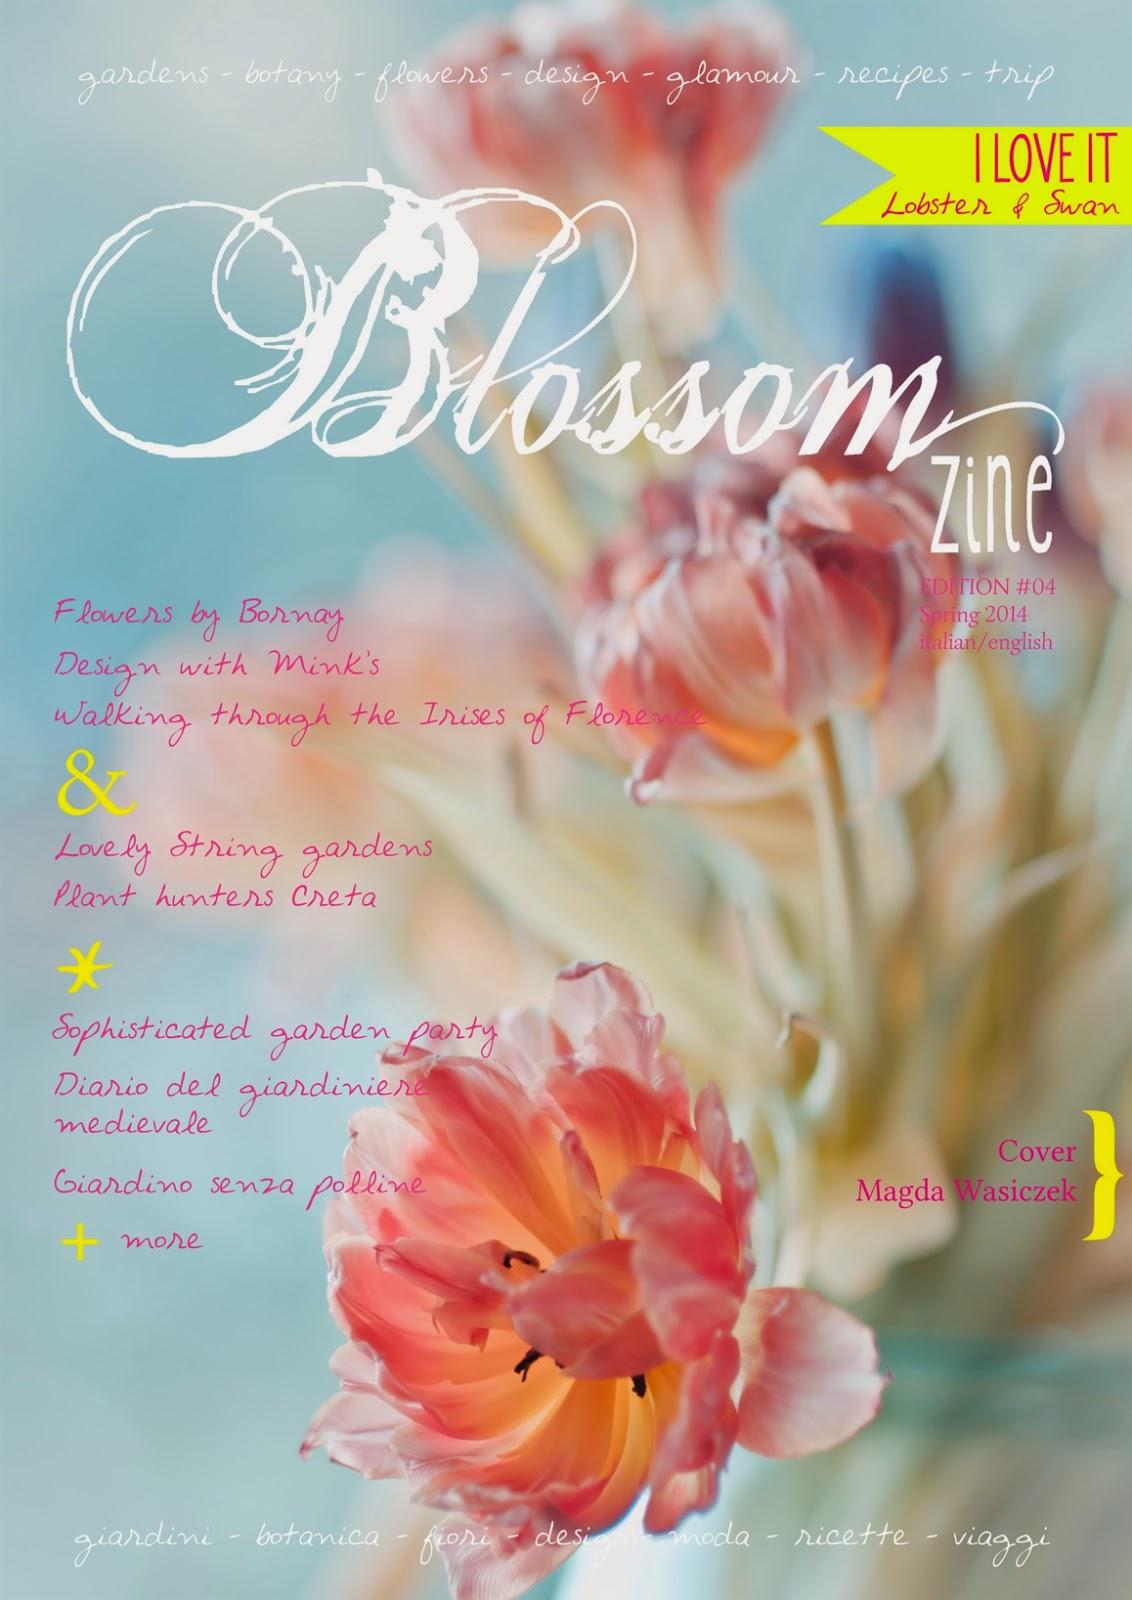 Flowers by bornay su blossom zine rivista online blossom - Flowers by bornay ...